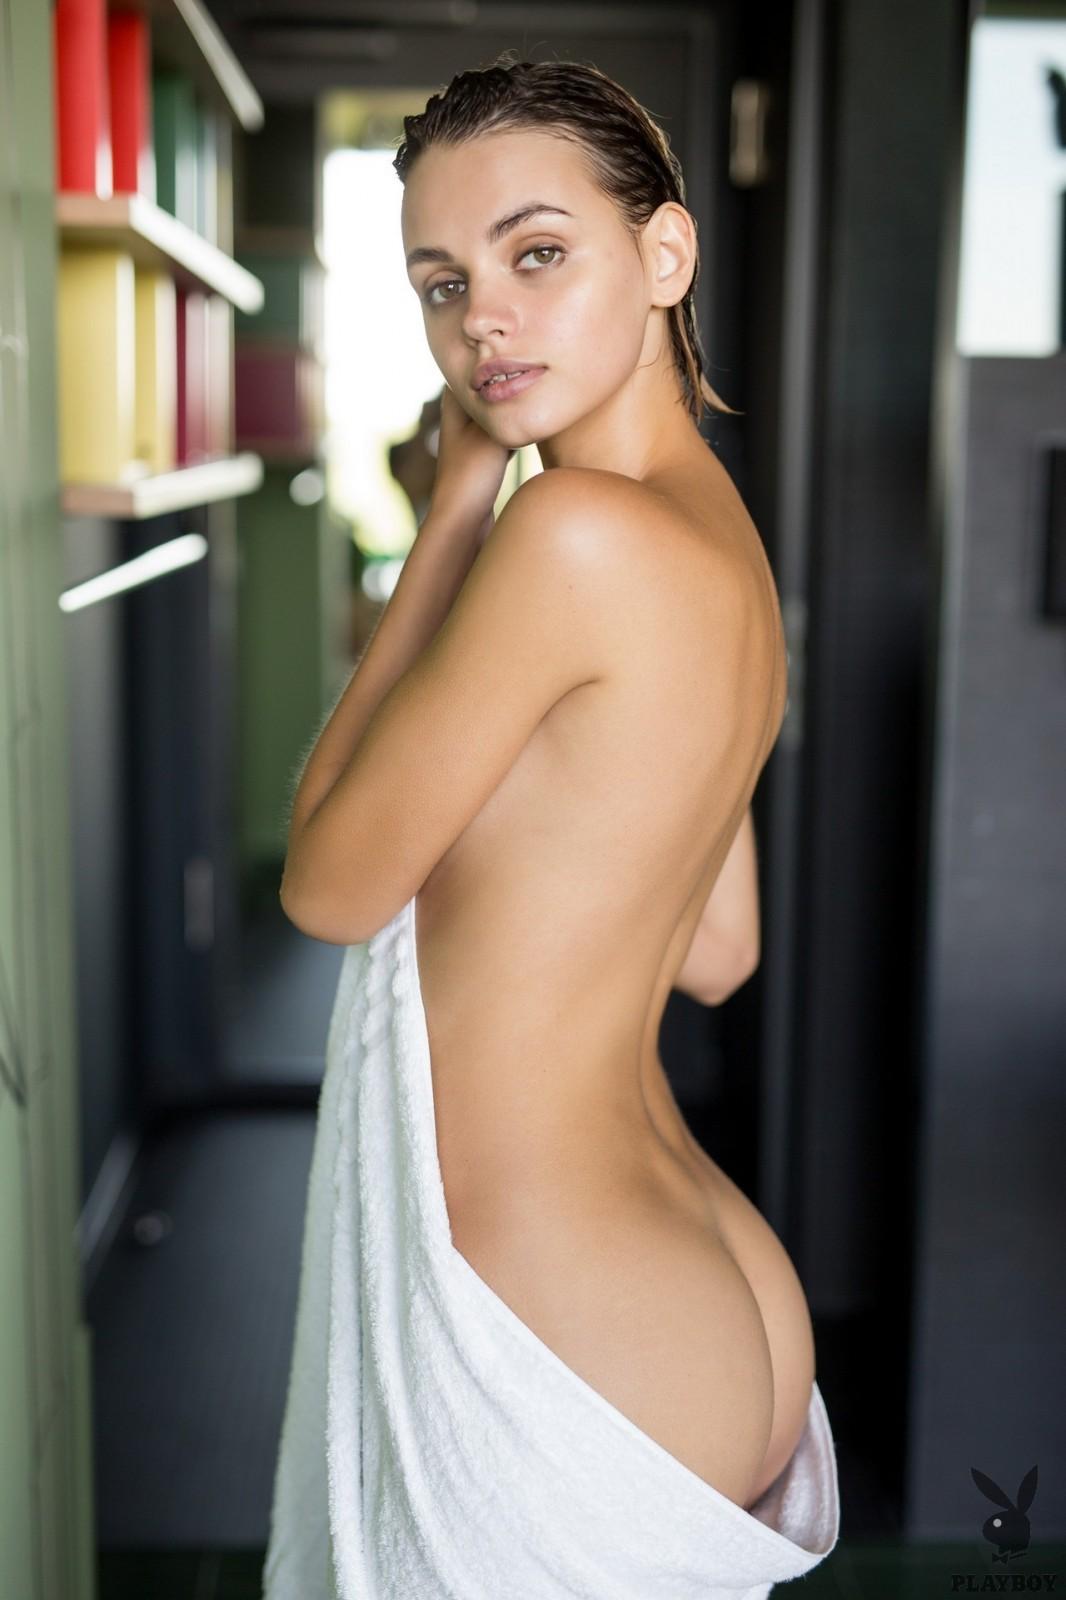 В полотенце после душа